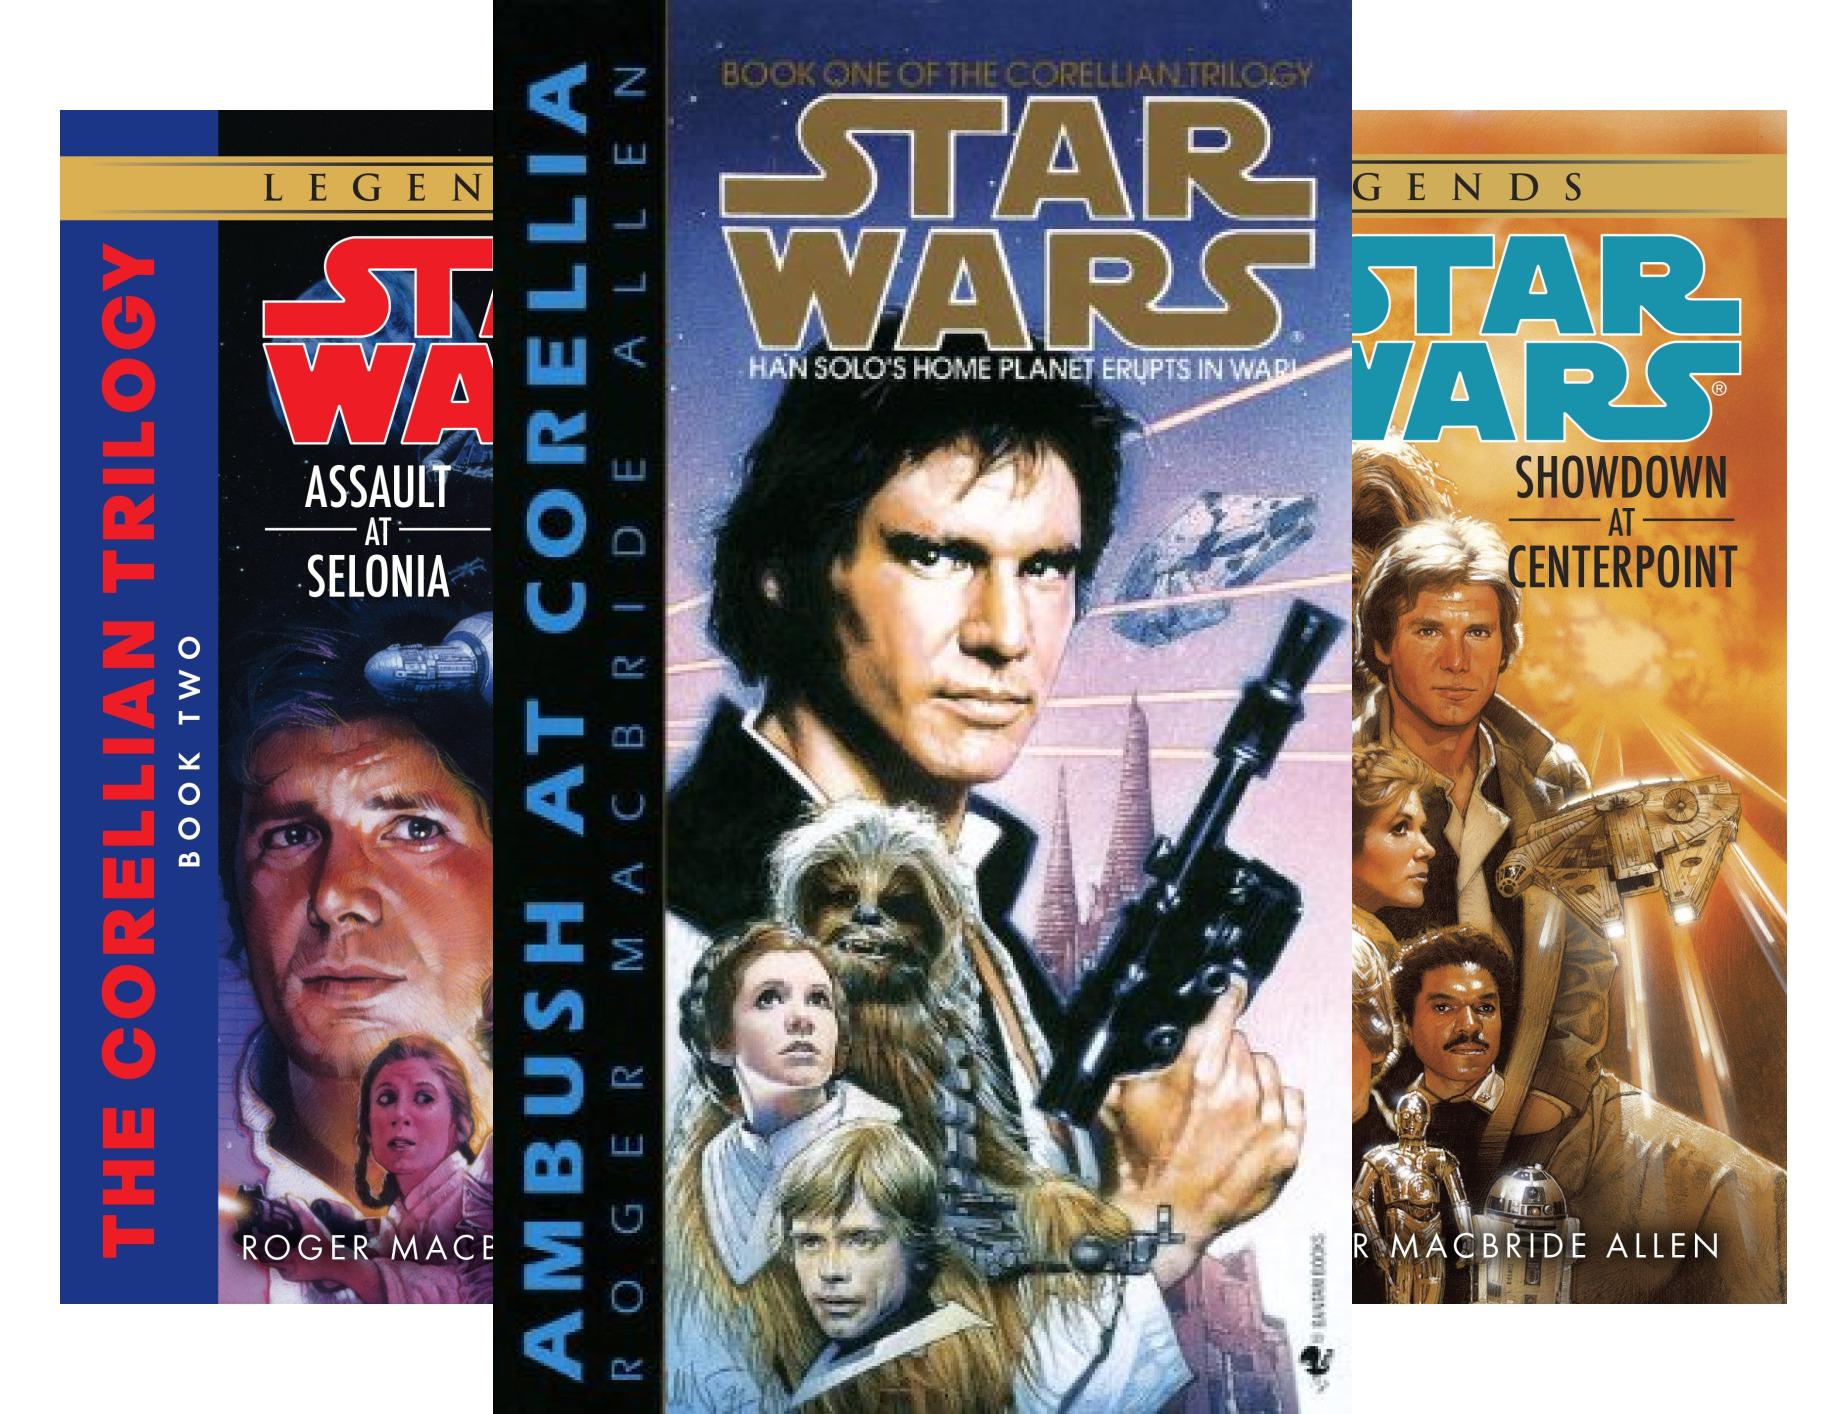 Star Wars: The Corellian Trilogy - Legends (3 Book Series)